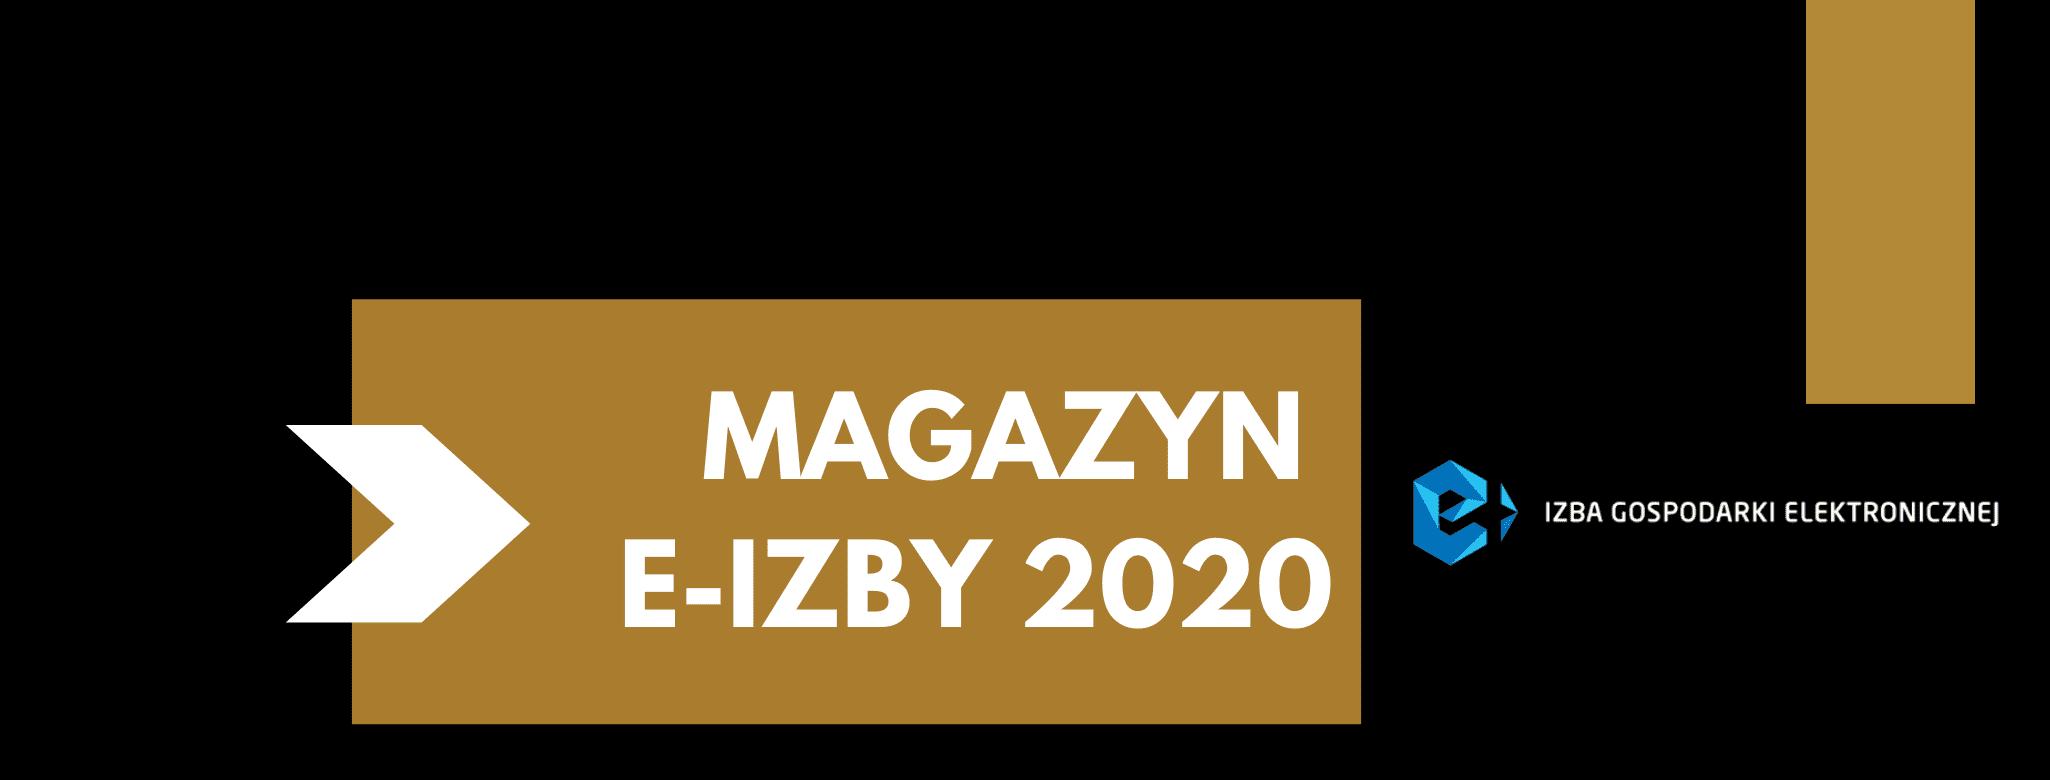 Magazyn e-Izby 2020 – zobacz podsumowanie roku i plany na 2021!